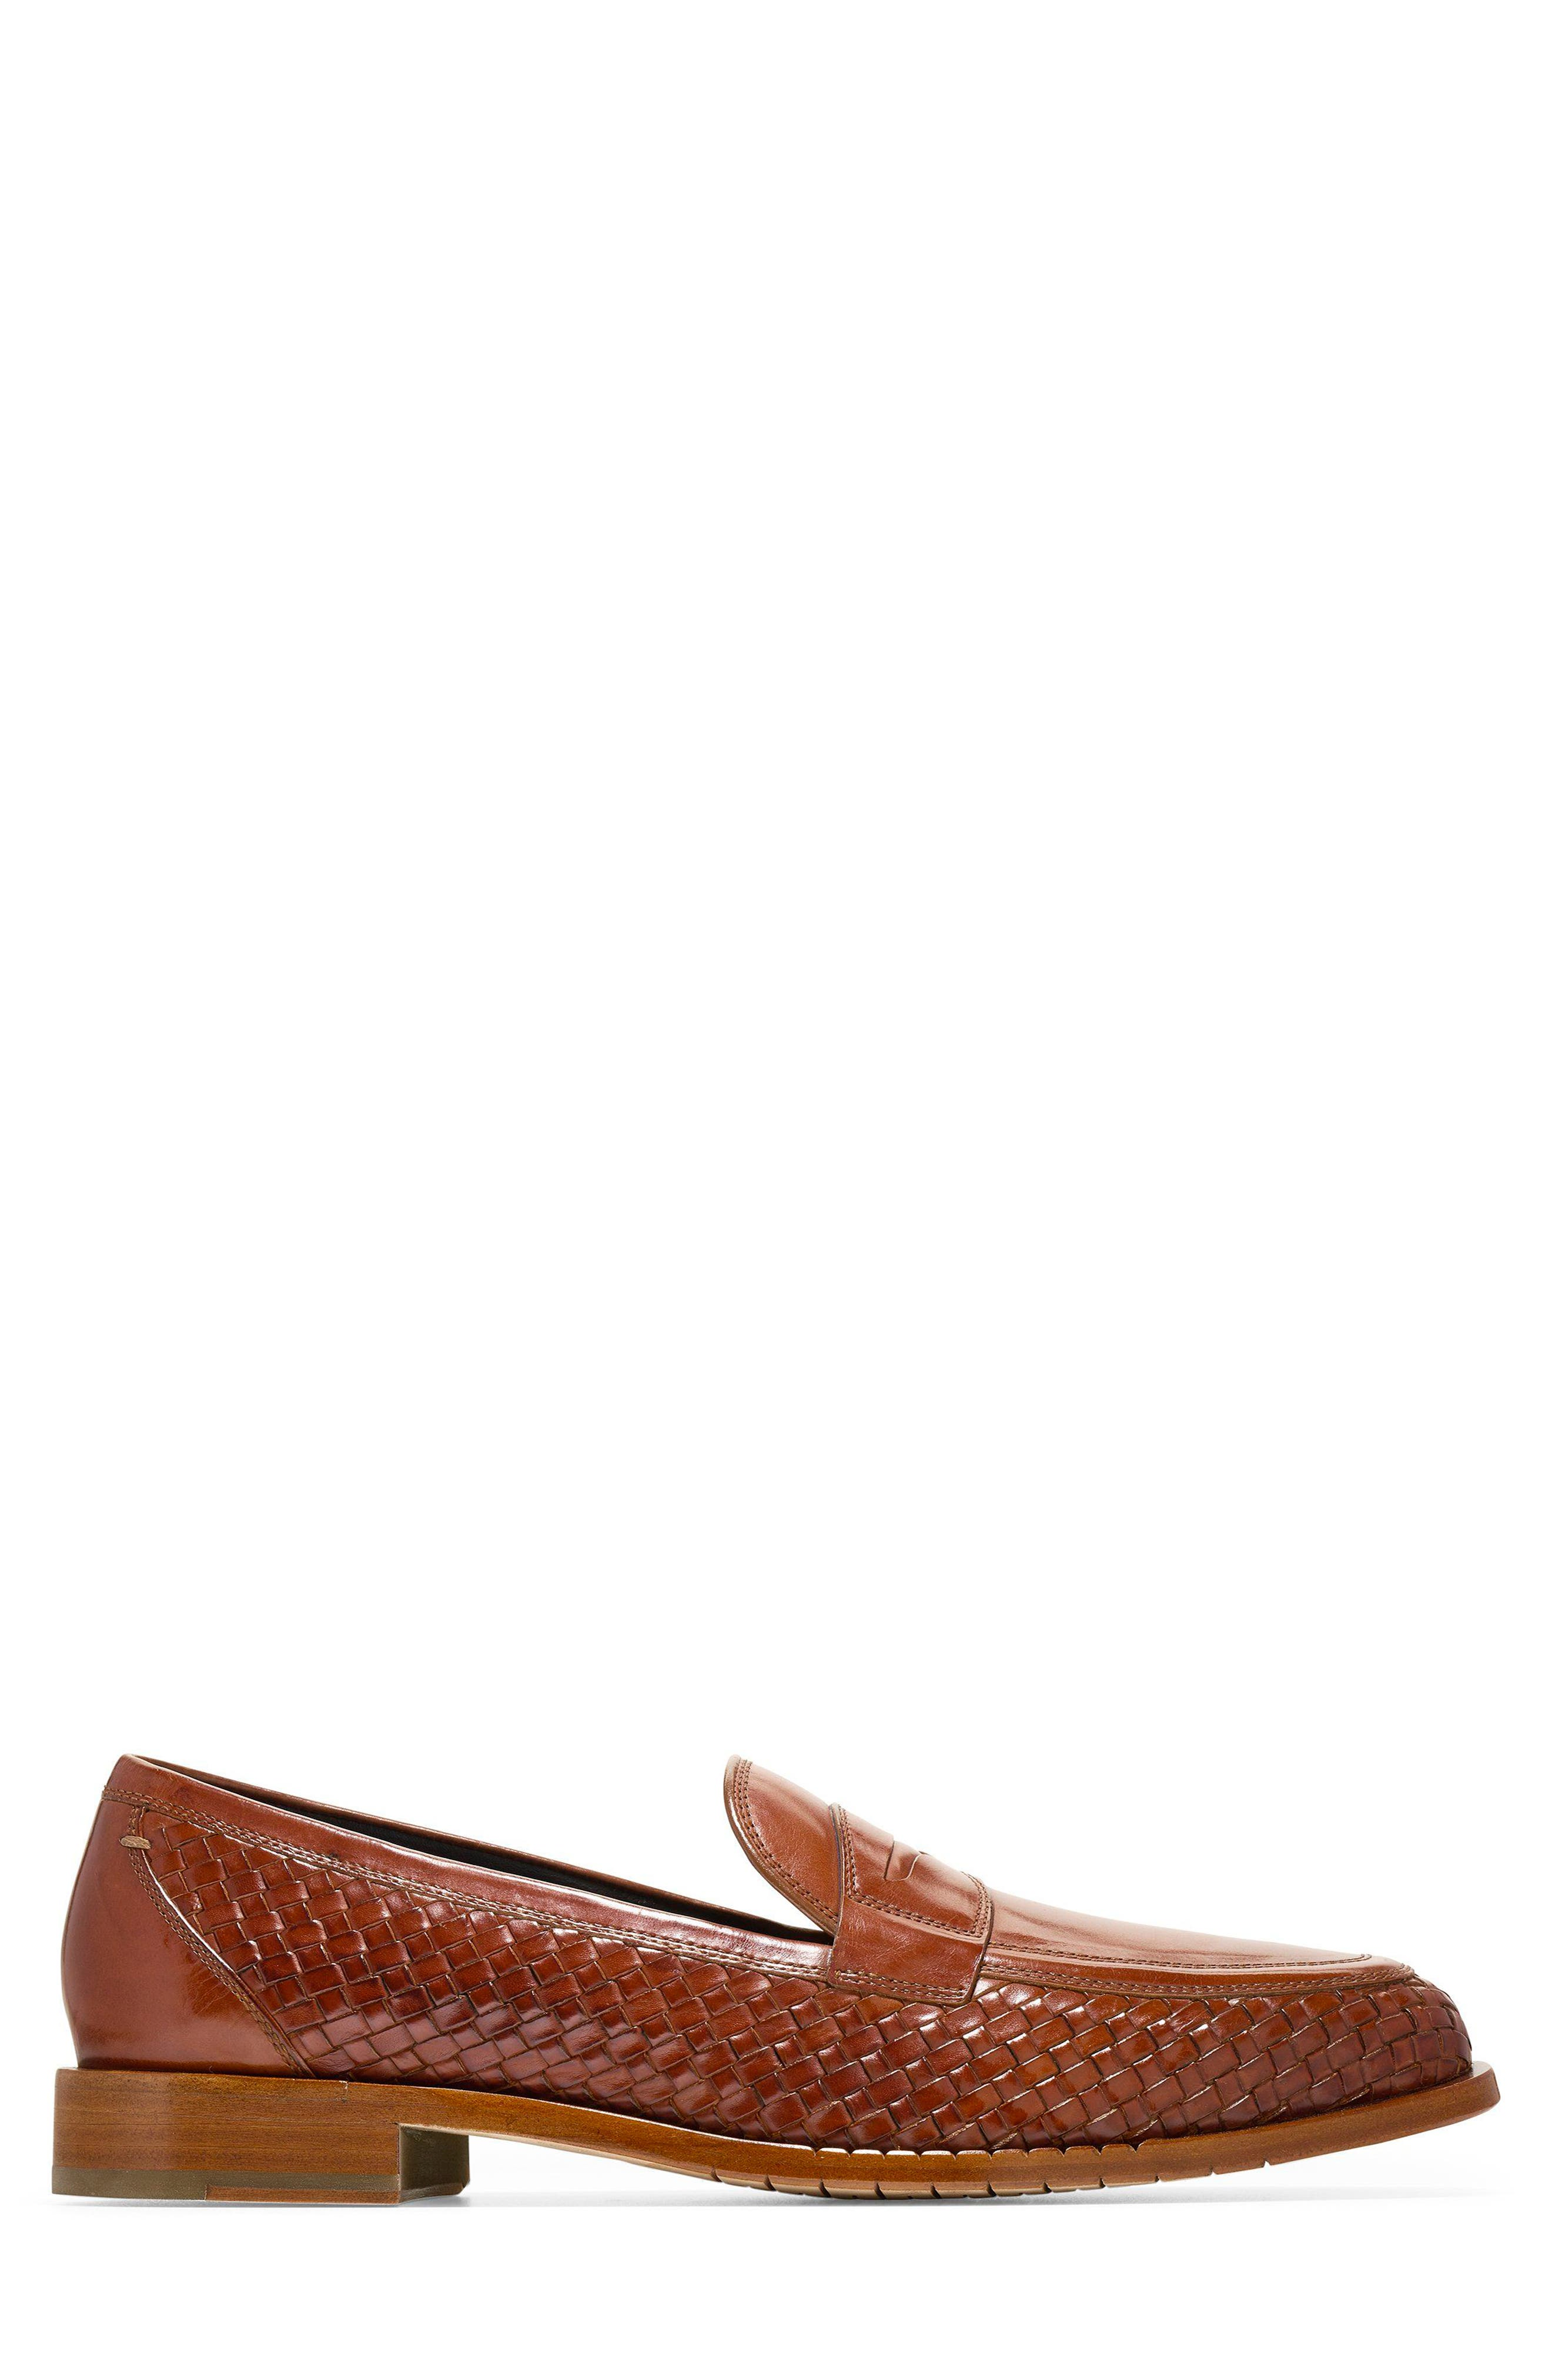 Washington Grand Penny Loafer,                             Alternate thumbnail 3, color,                             British Tan Woven